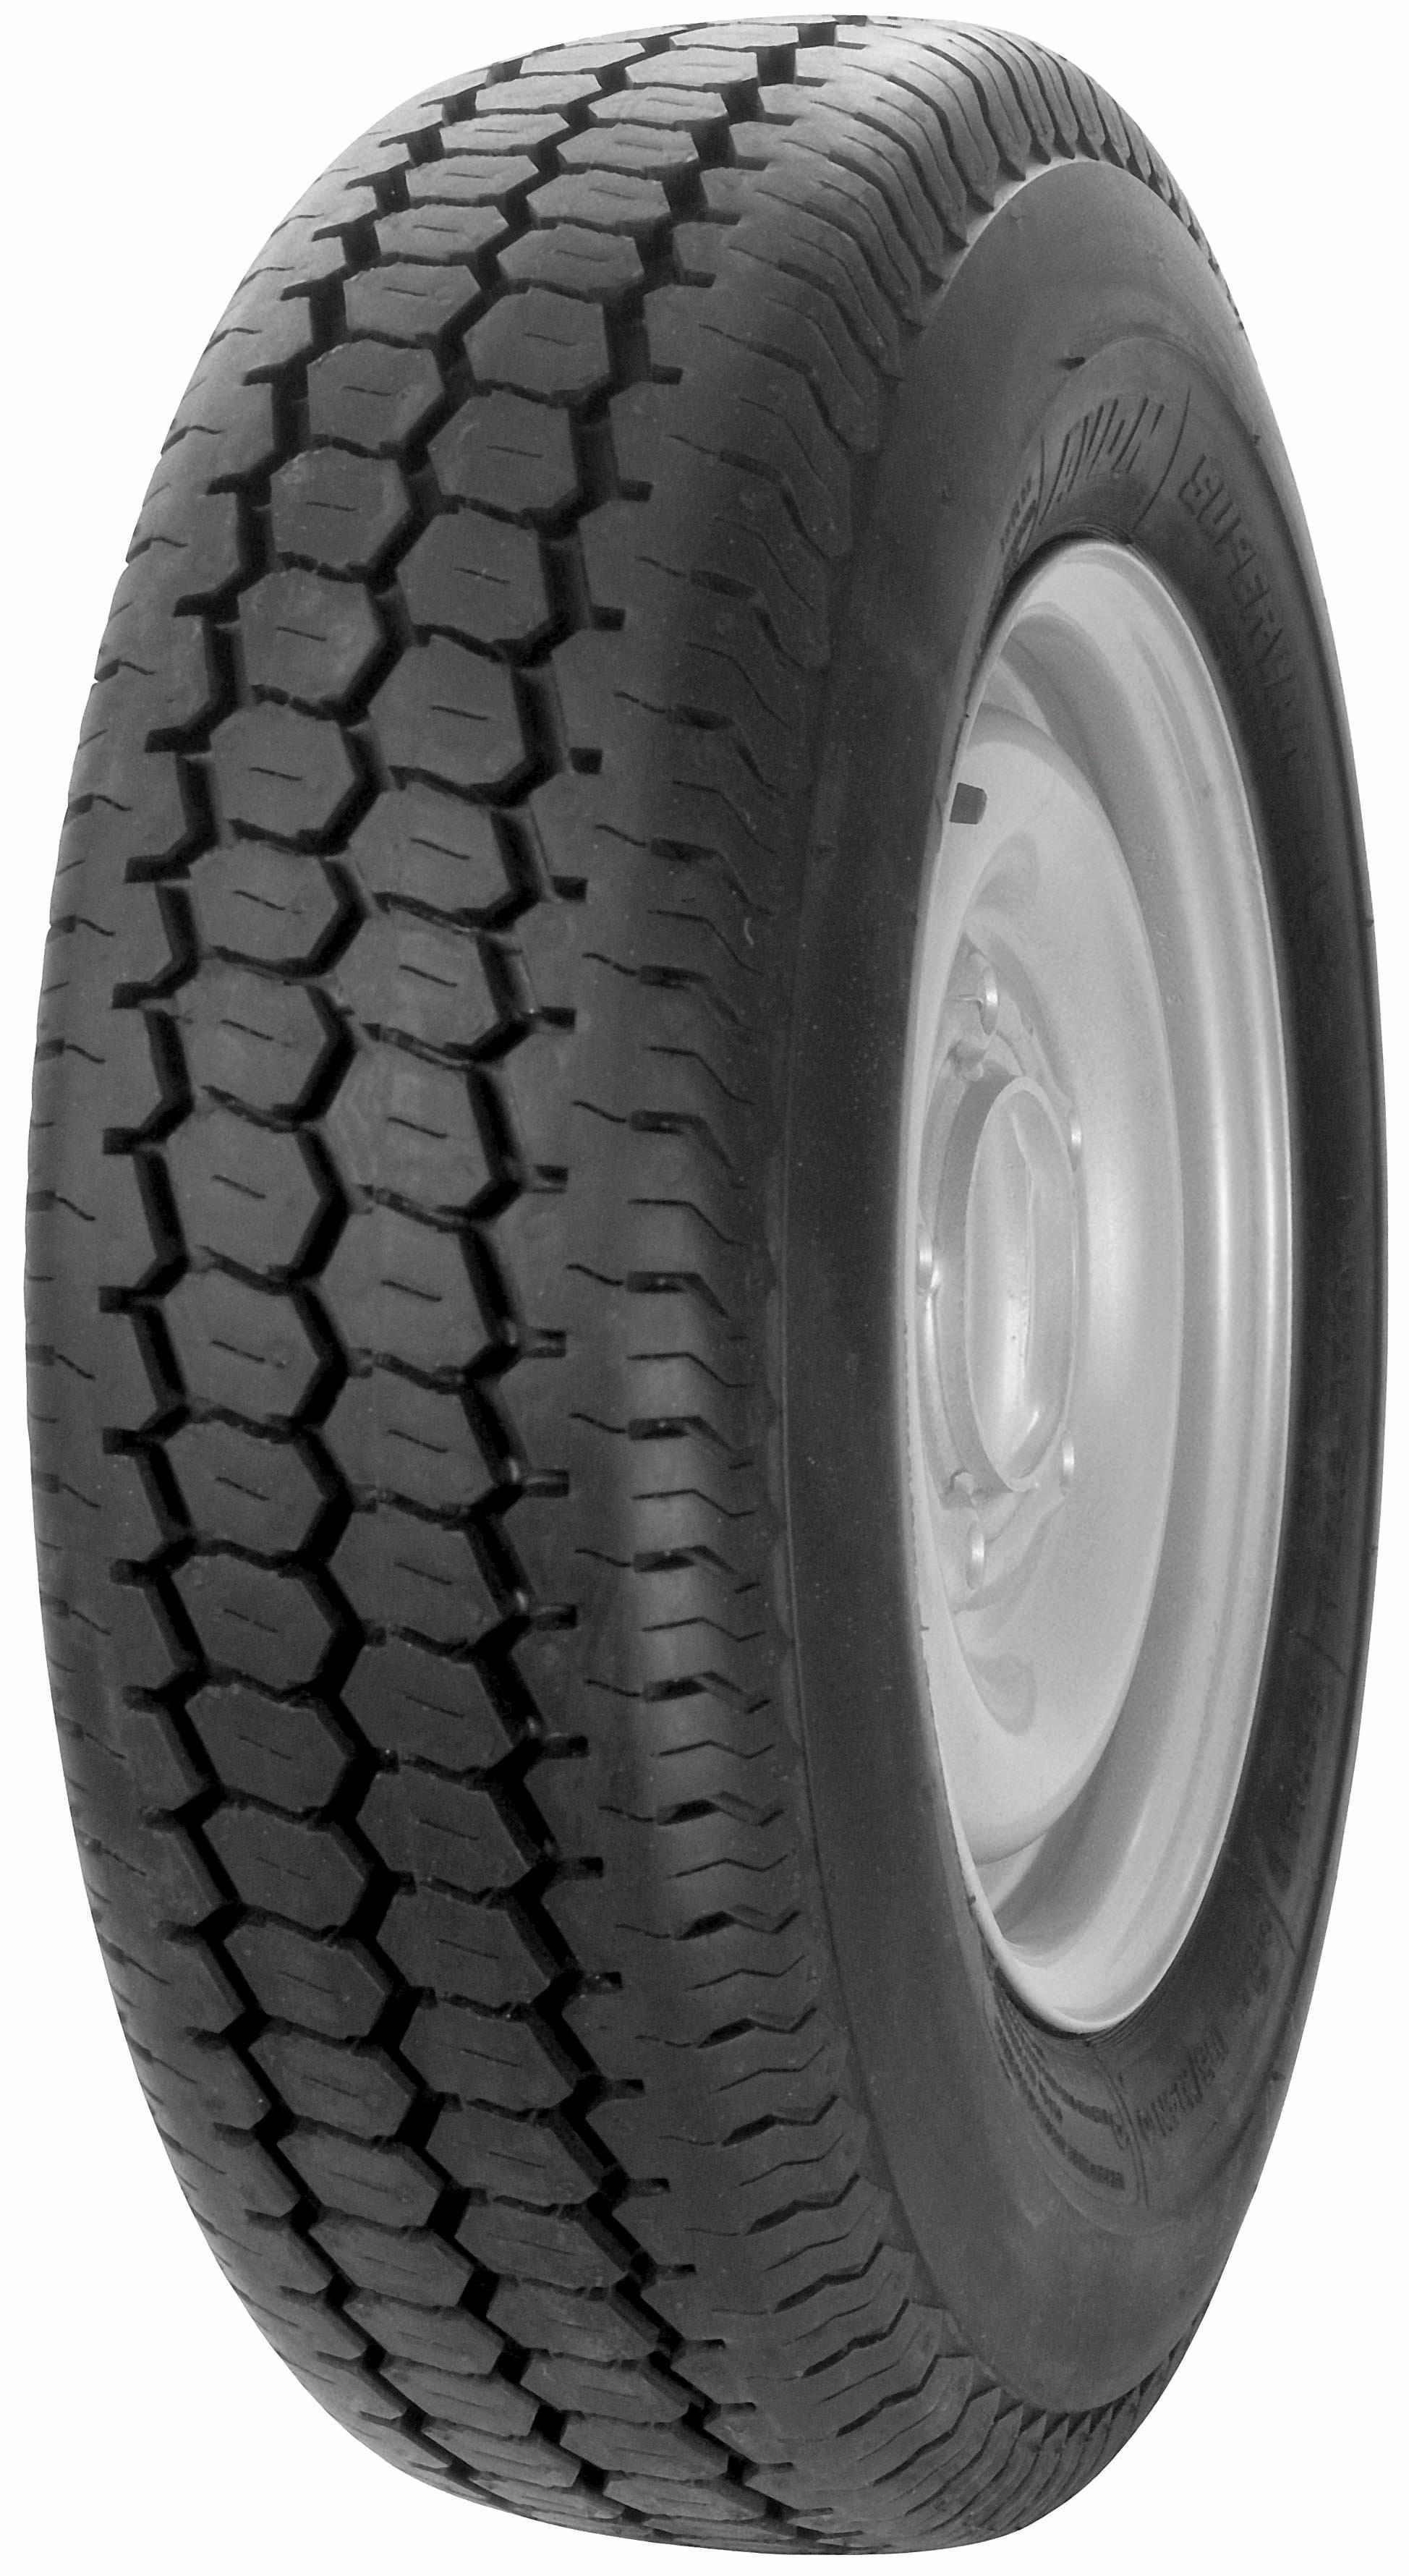 Neumático AVON AV4 195/0R14 106 N